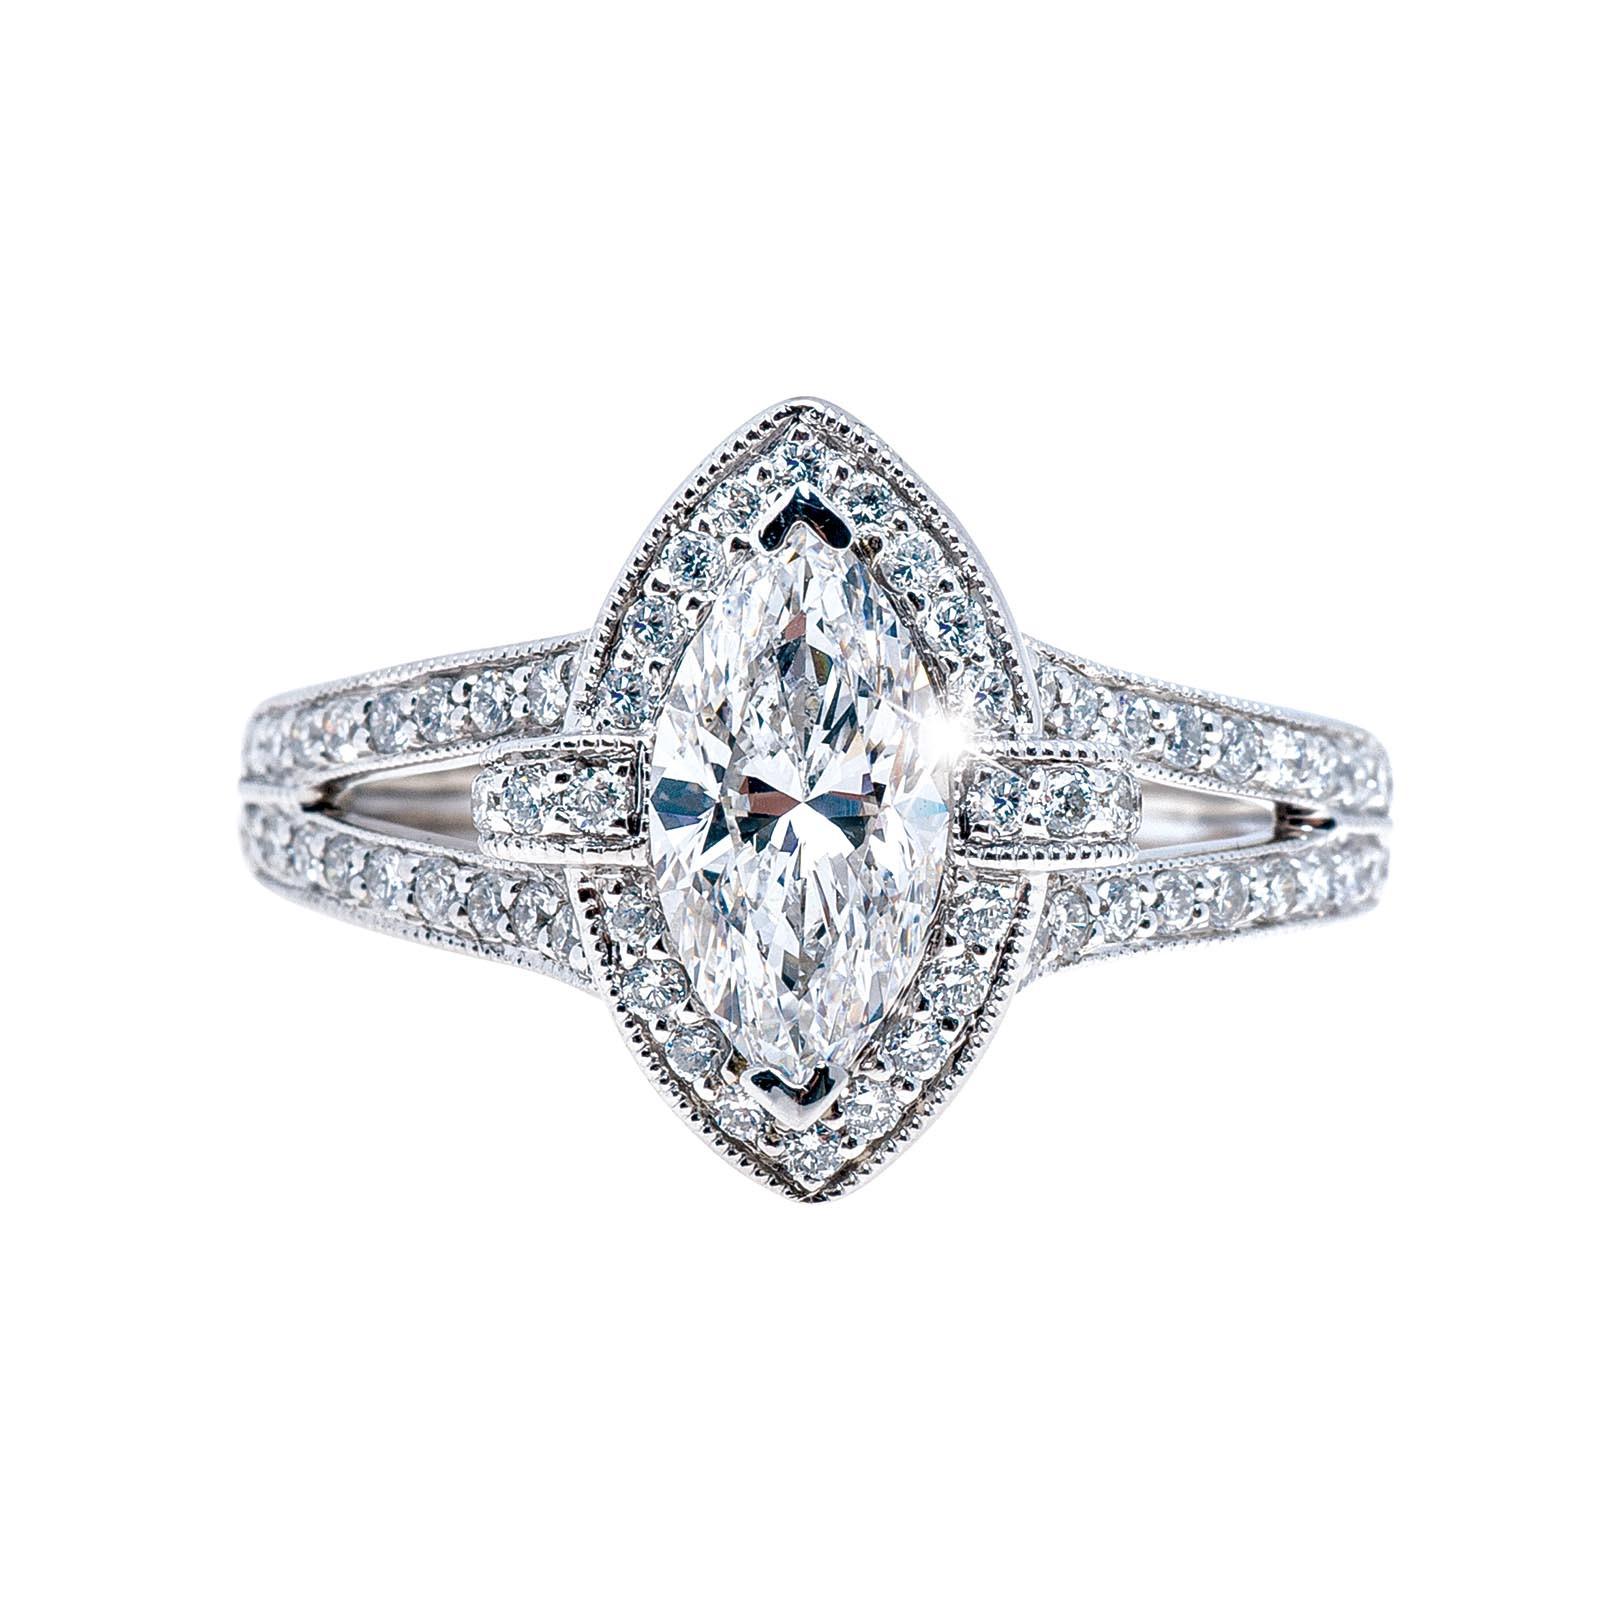 New Venetti 1.51 CTW Diamond Halo Engagement Ring